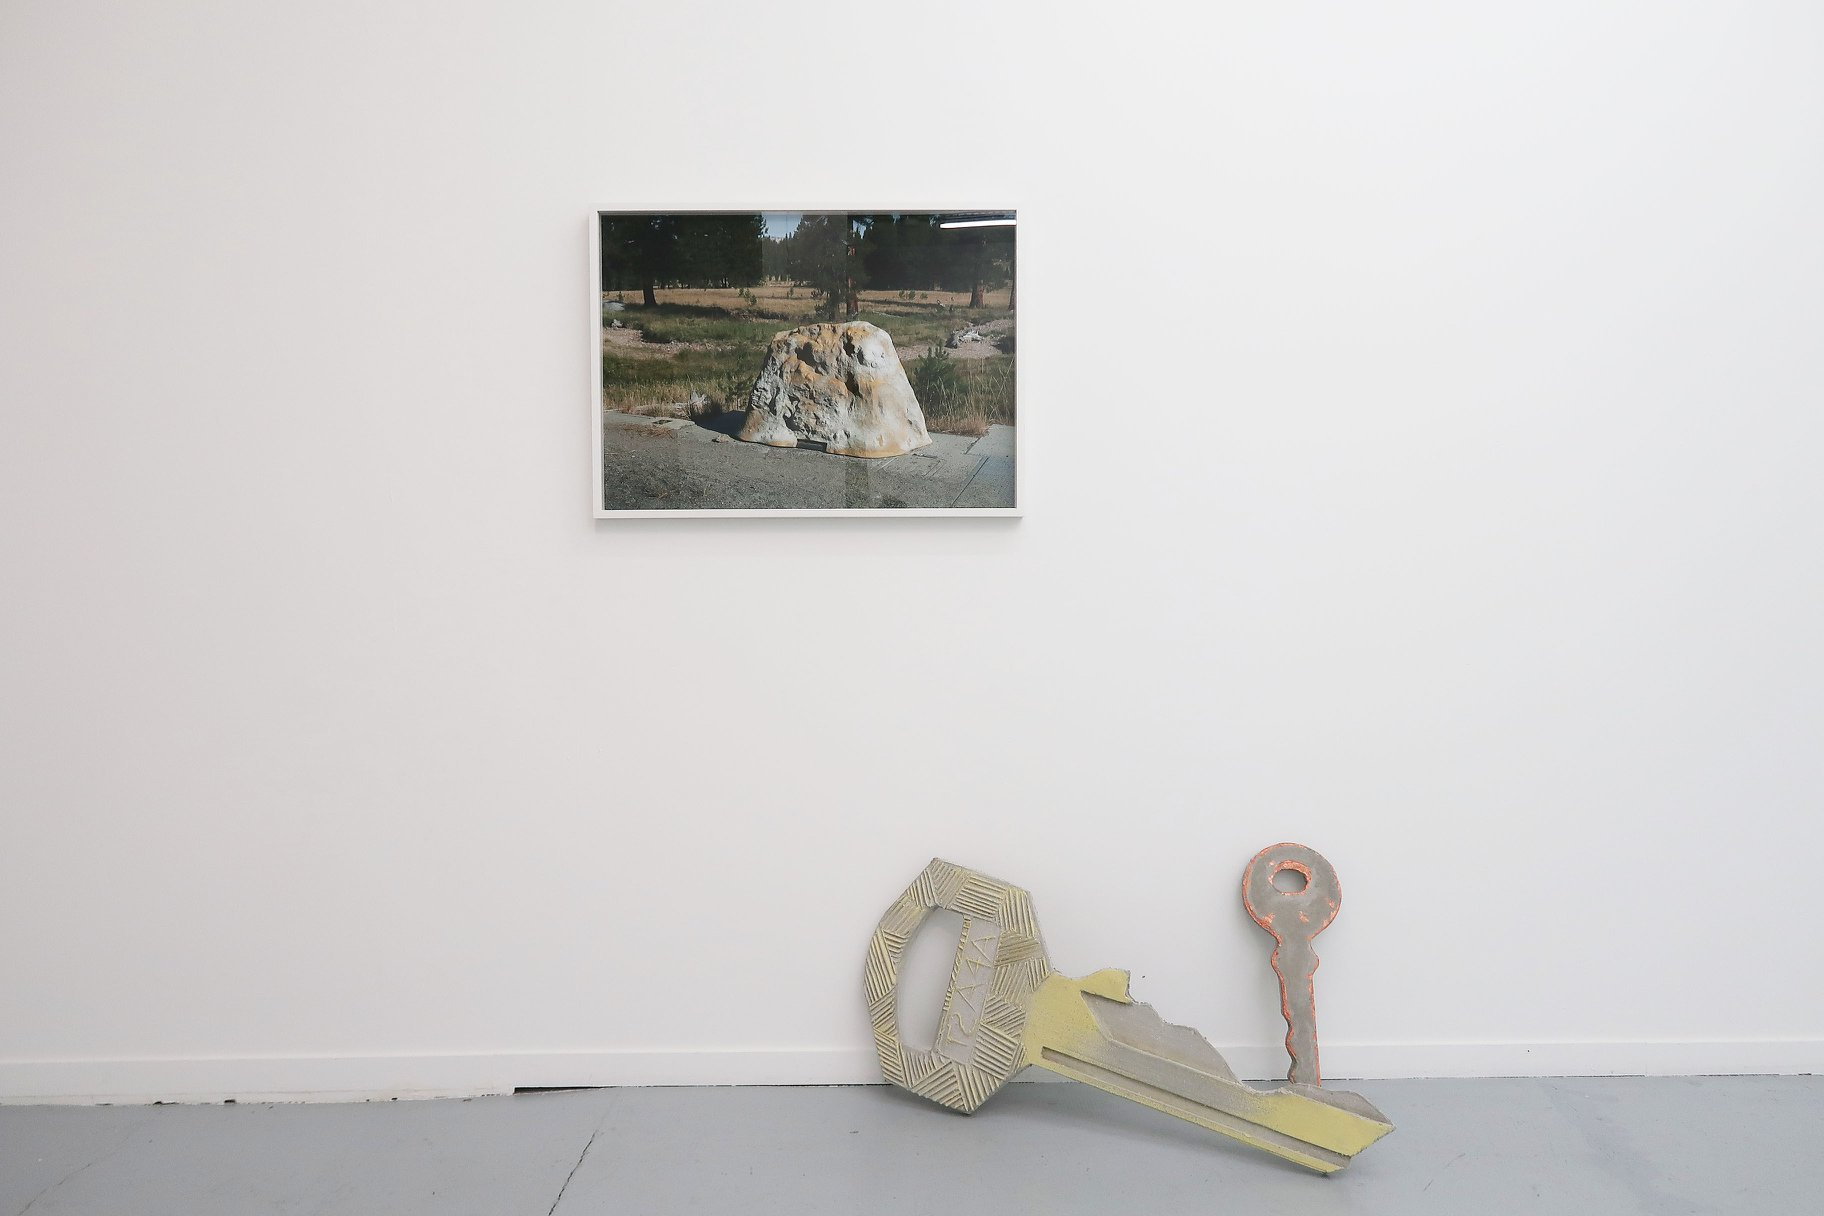 Léonie Young (Photo) et Anna Raczynska (Sculpture)